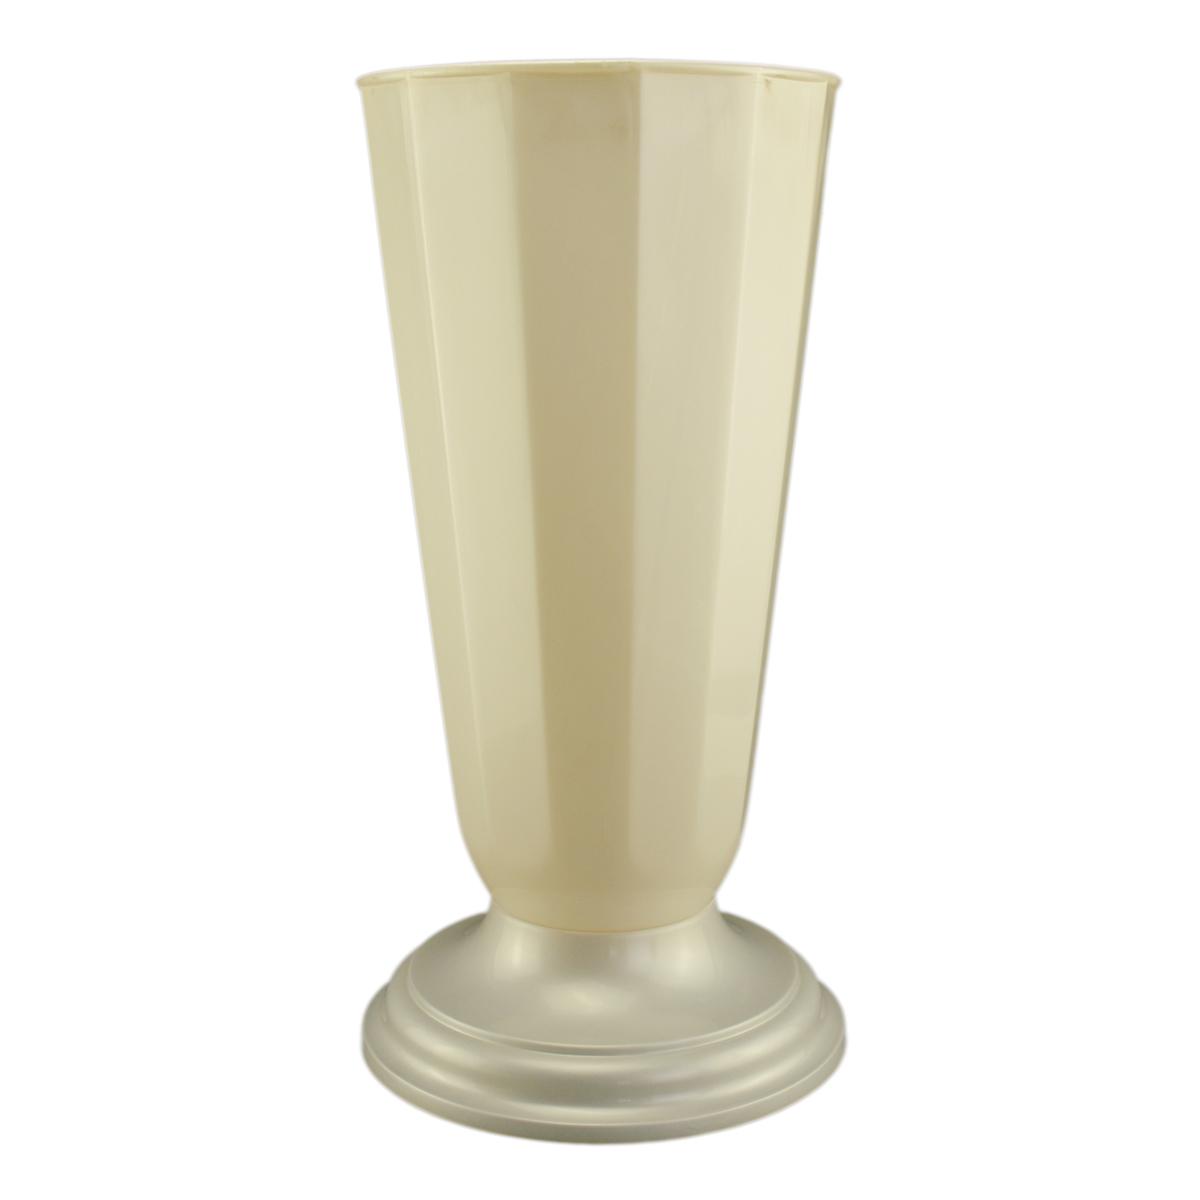 Ambalaje Flori ONLINE vinde Vaza podea 32x49 cm alb perlat la pretul de 24.99 lei